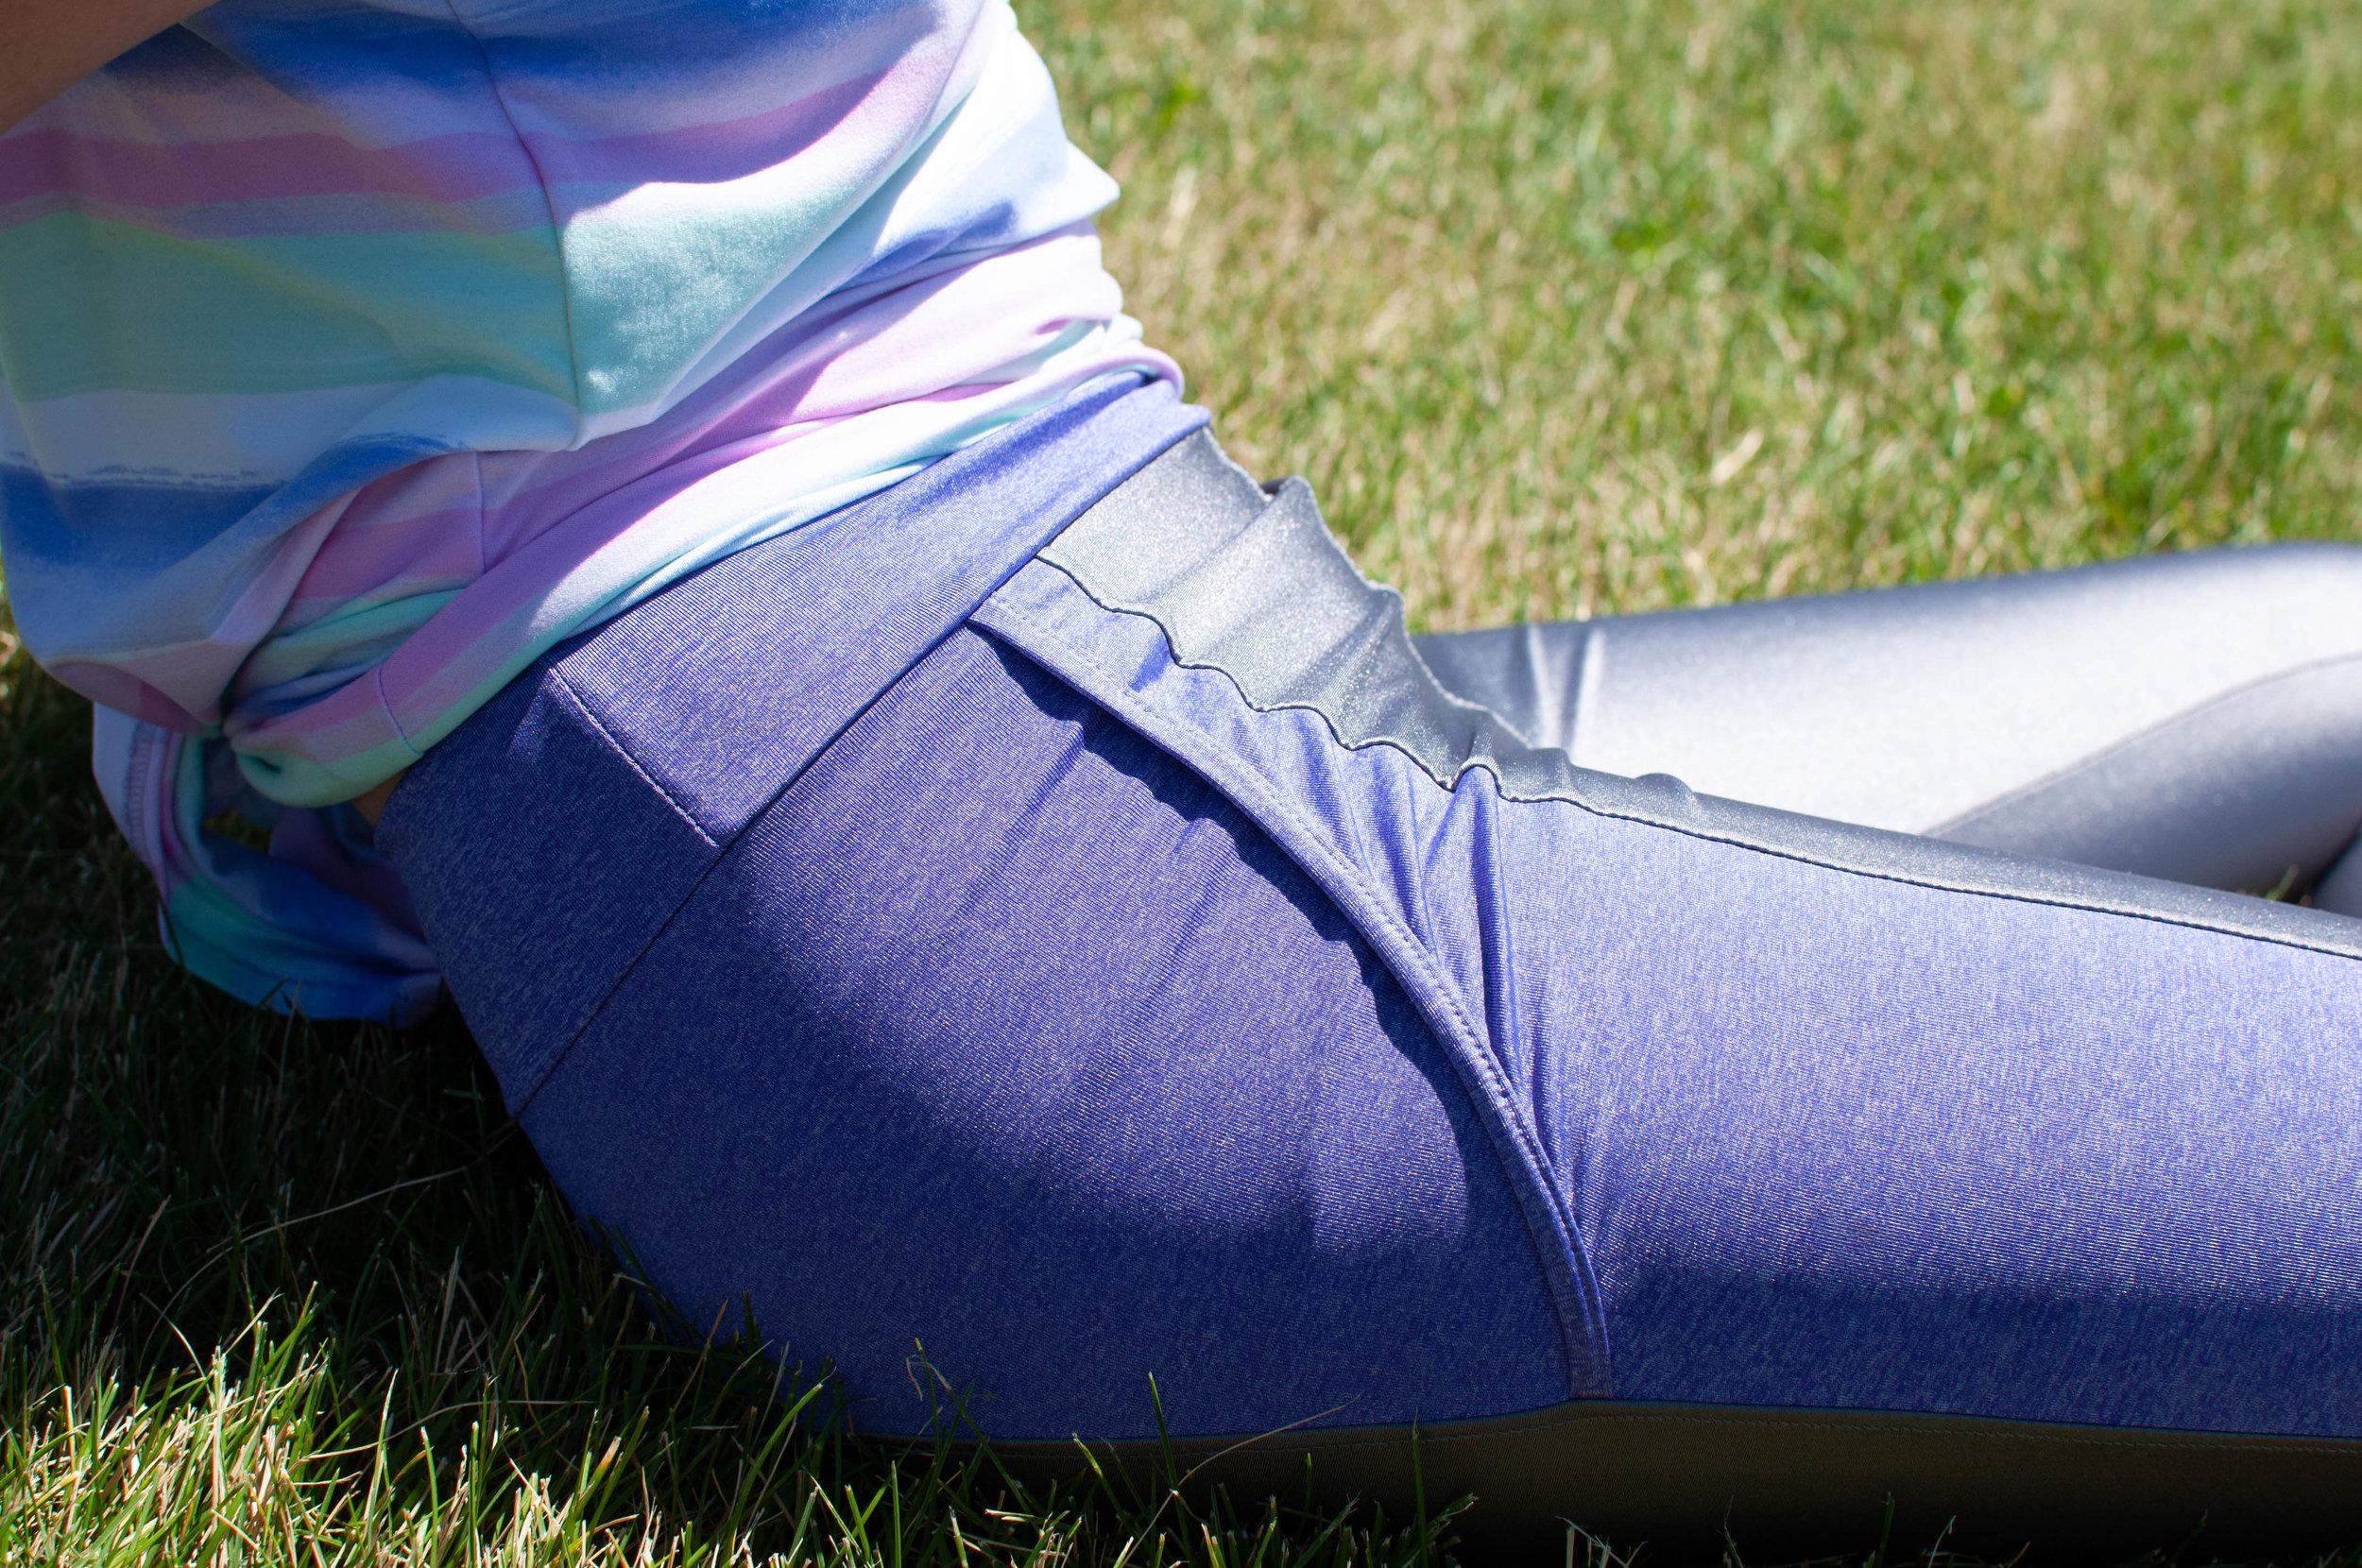 Sewing activewear, running leggings pattern: Simplicity 8634